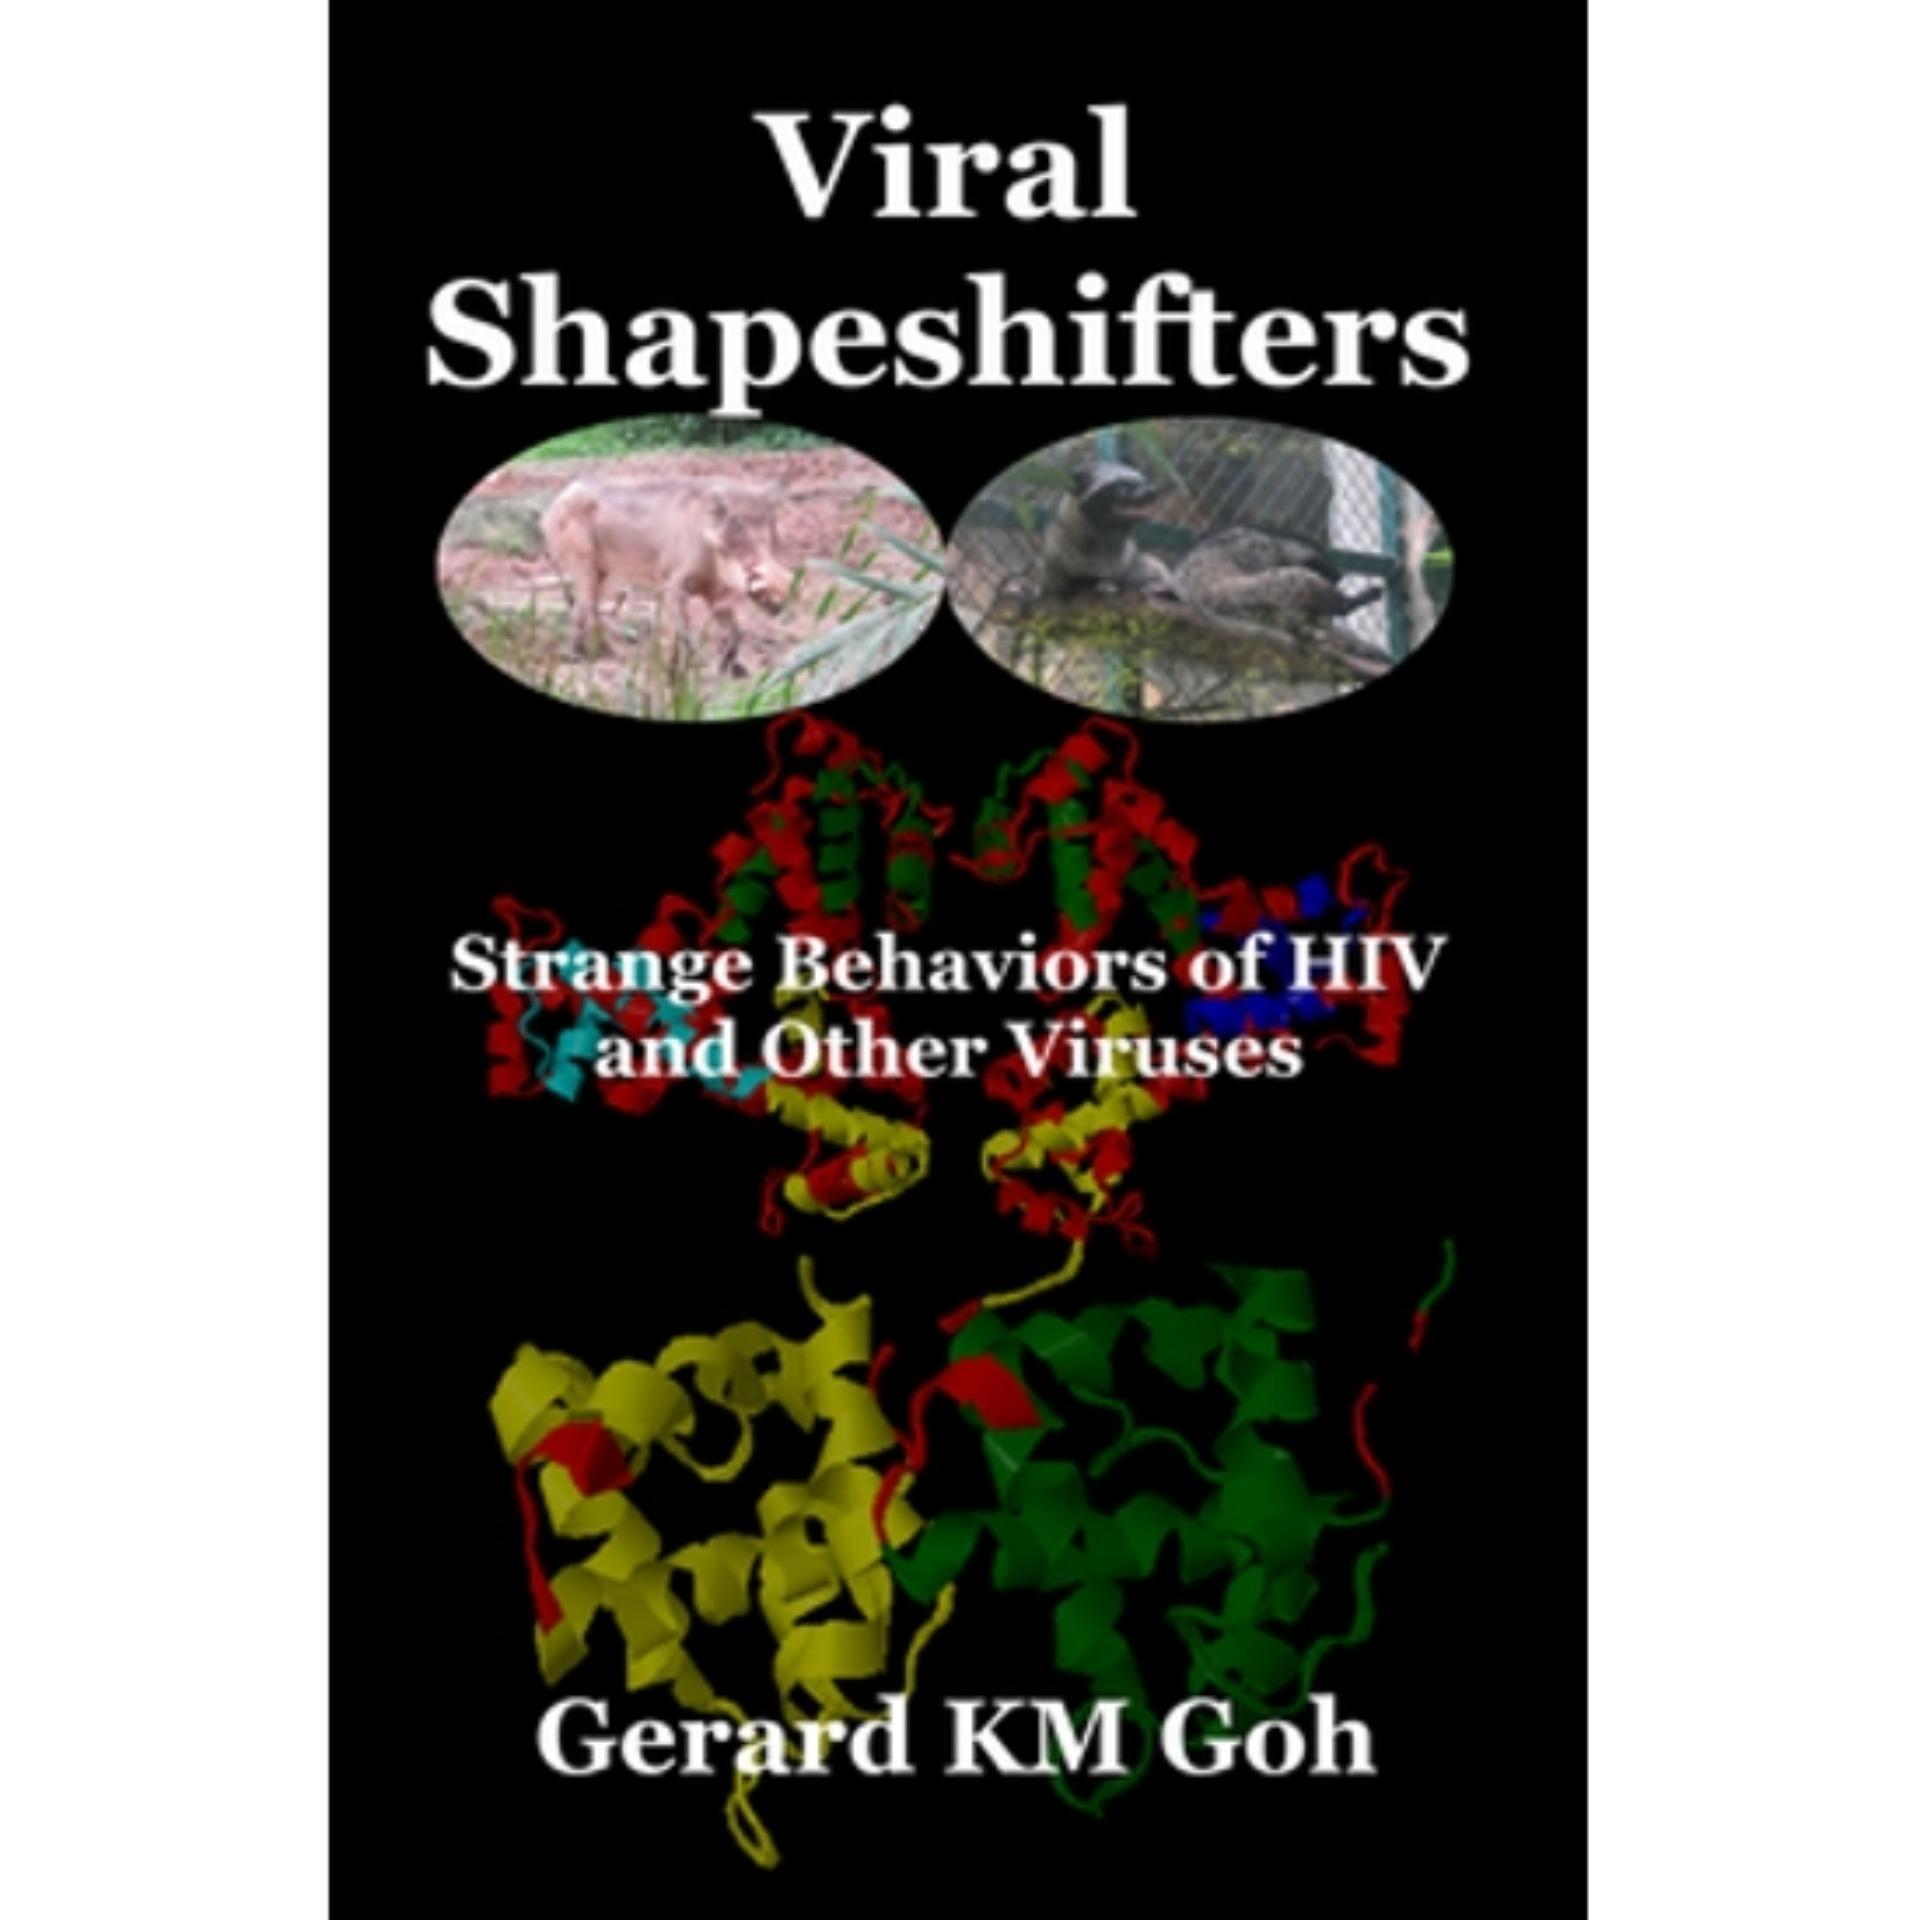 Viral Shapeshifters: Strange Behaviors of HIV and Other Viruses